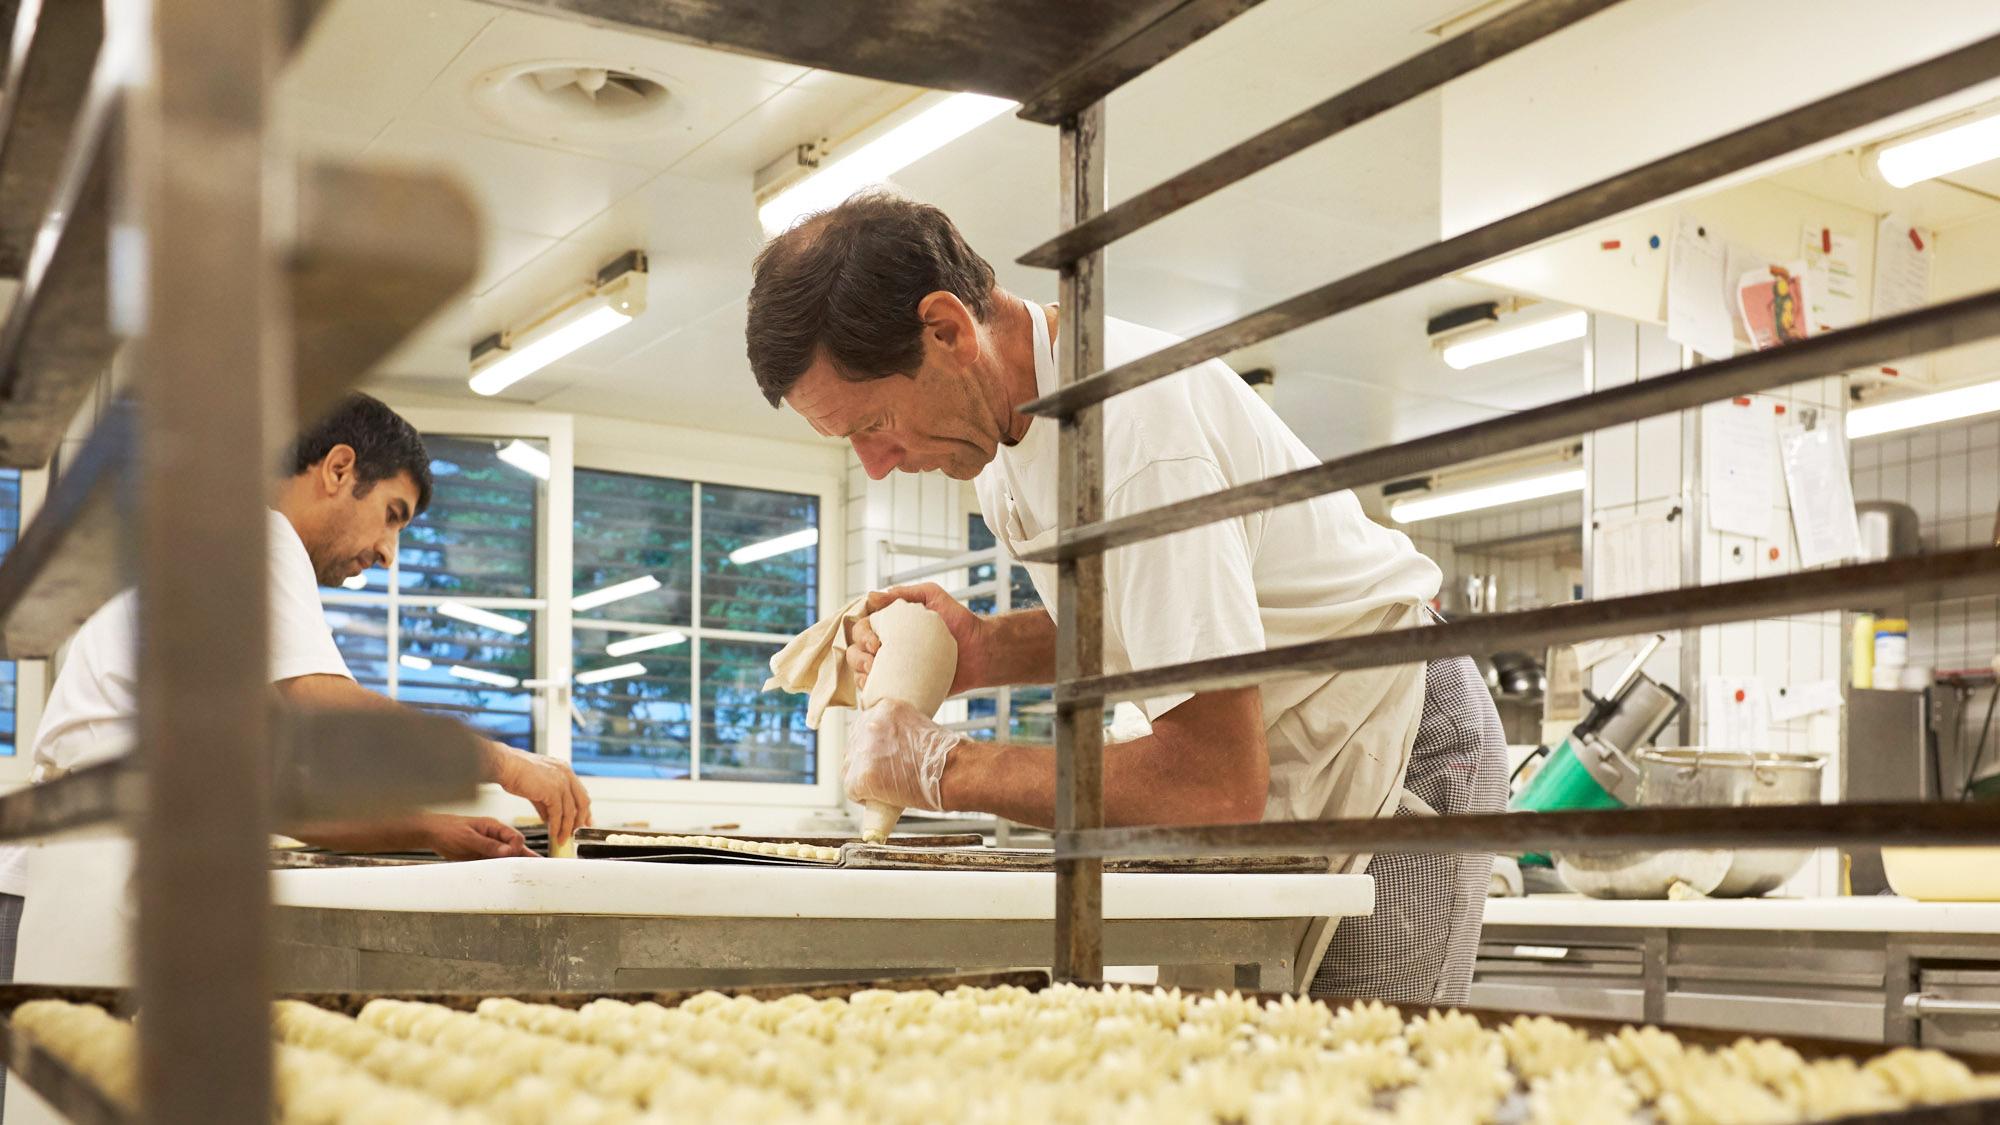 Nach dem Brot kommt das Spritzgebäck dran: Markus Krebs legt in seiner Bäckerei selbst Hand an.